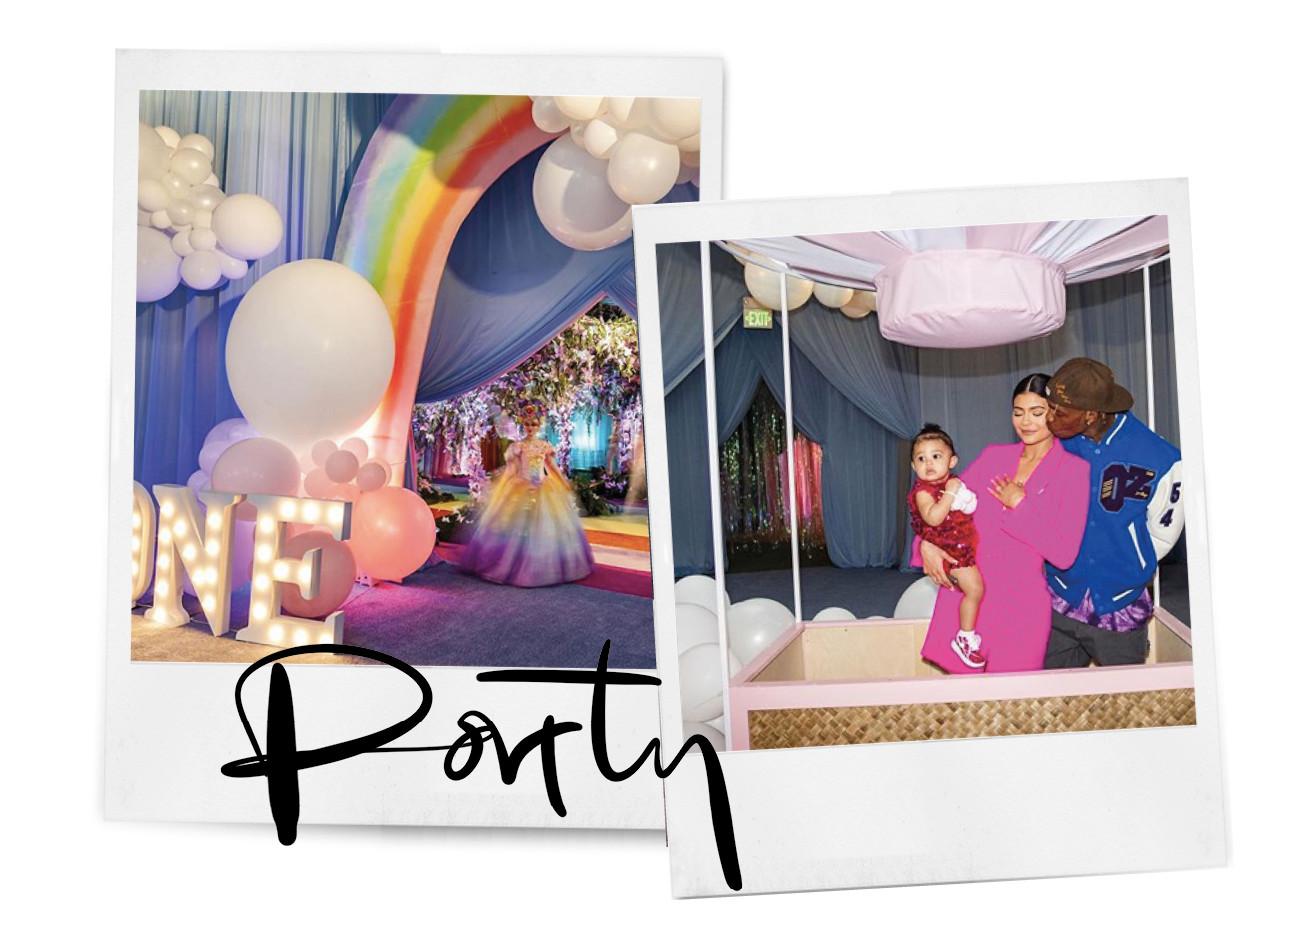 eerste verjaardagsfeestje van stormi webster jenner